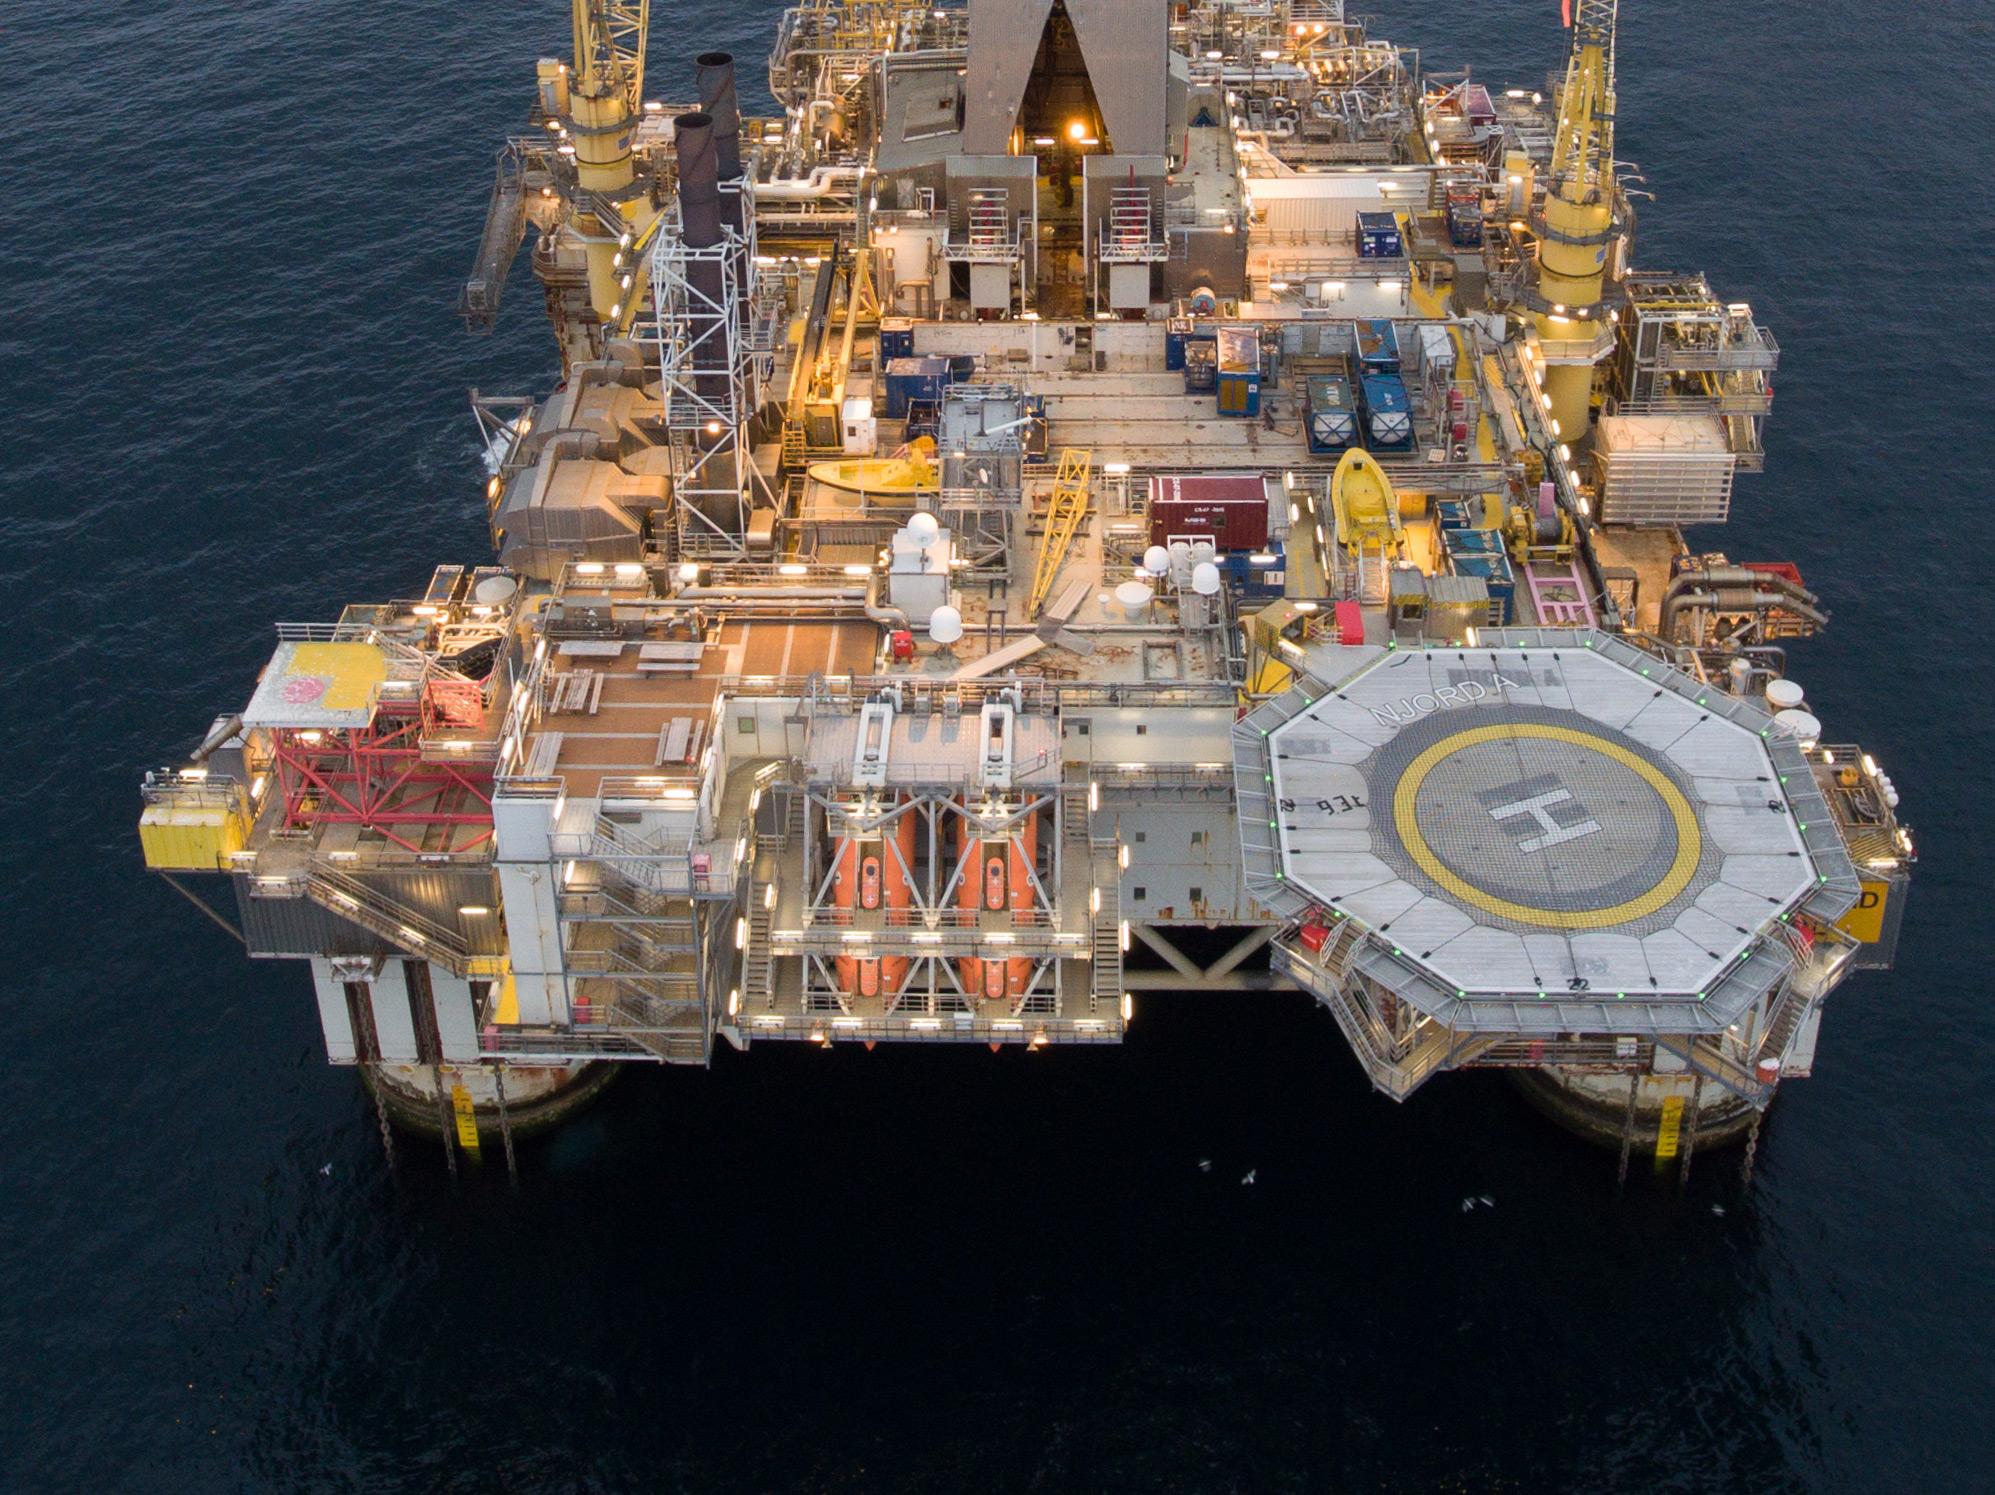 Statoil Greenlights Key $6 Billion Norway Arctic Oil Project